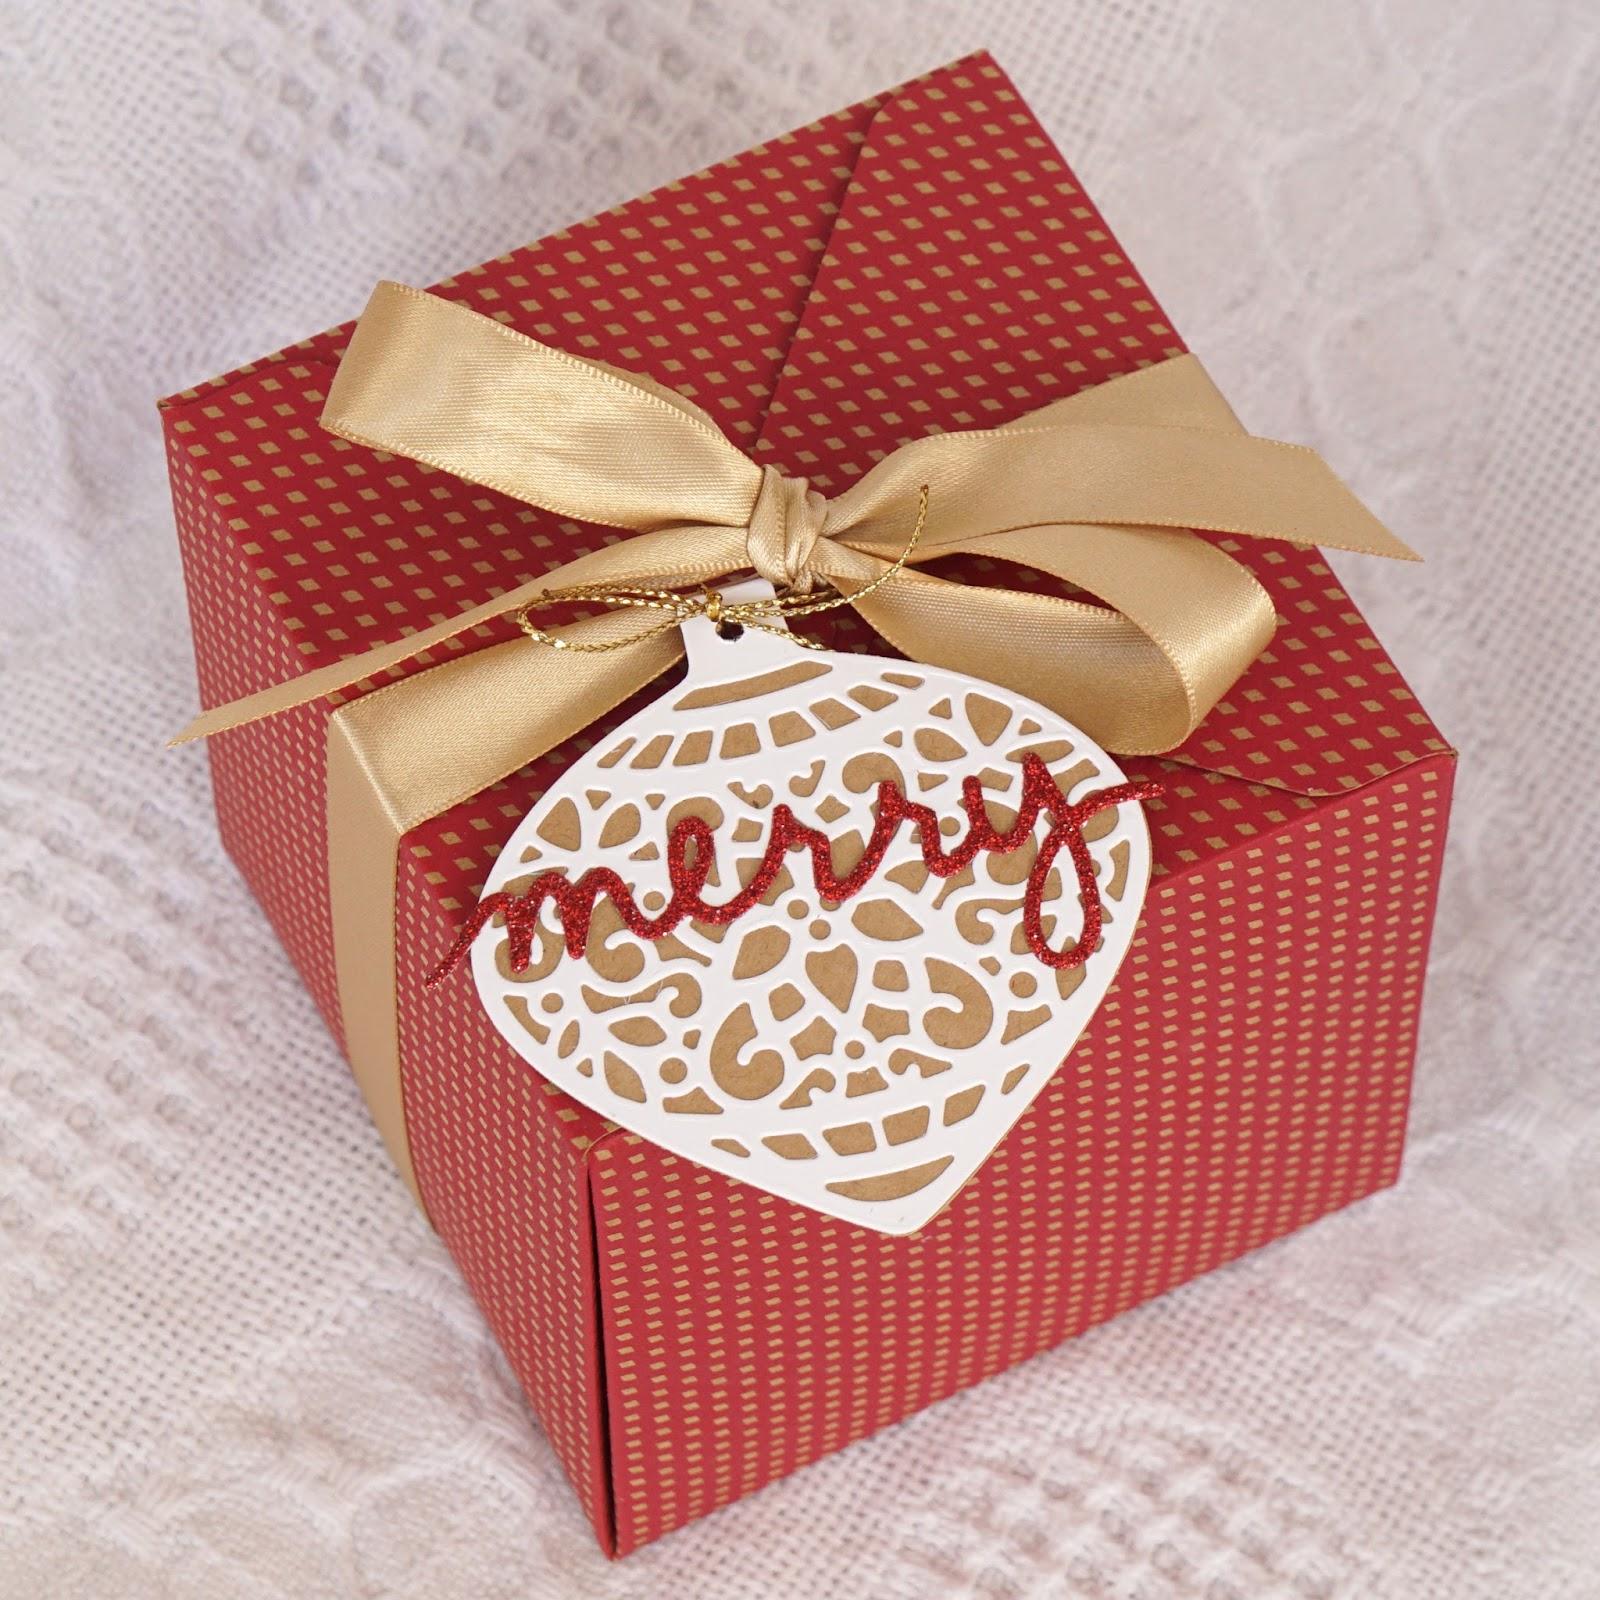 Colour me happy last christmas ornaments boxes today